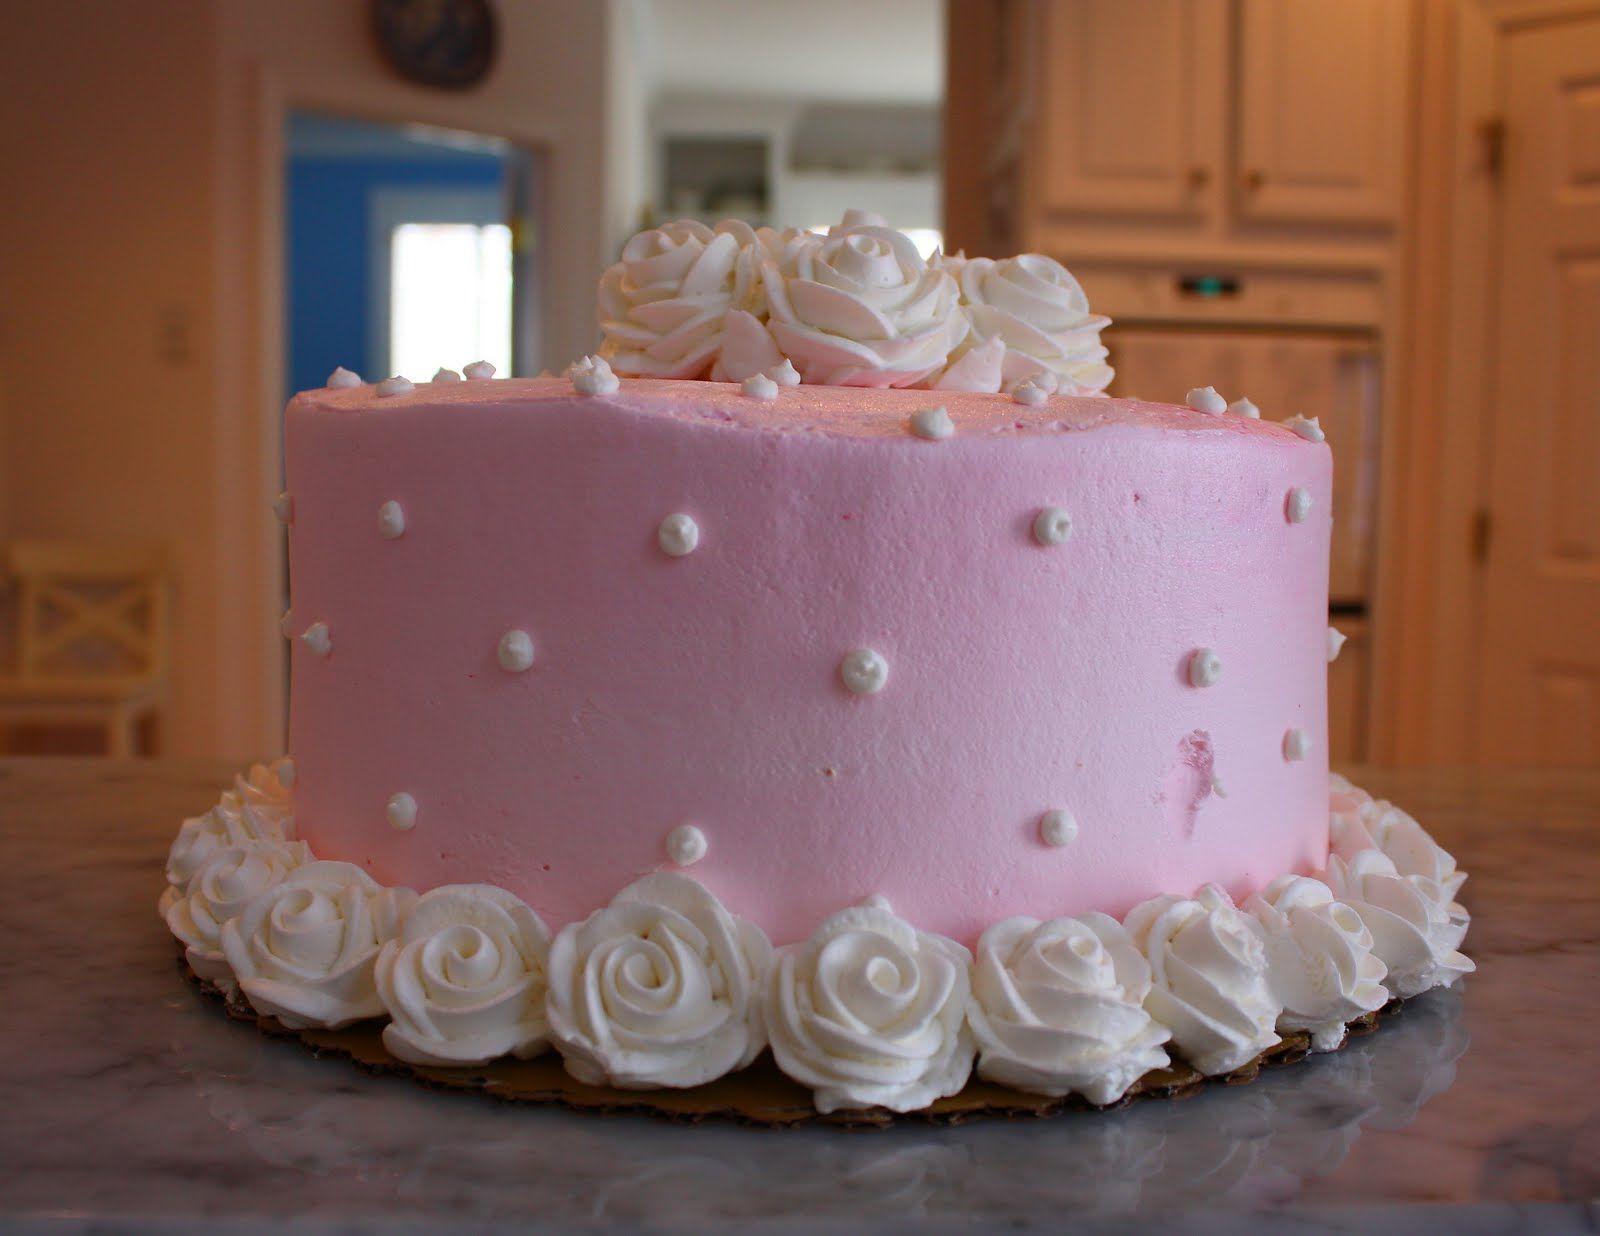 publix wedding cakes Google Search Publix wedding cake